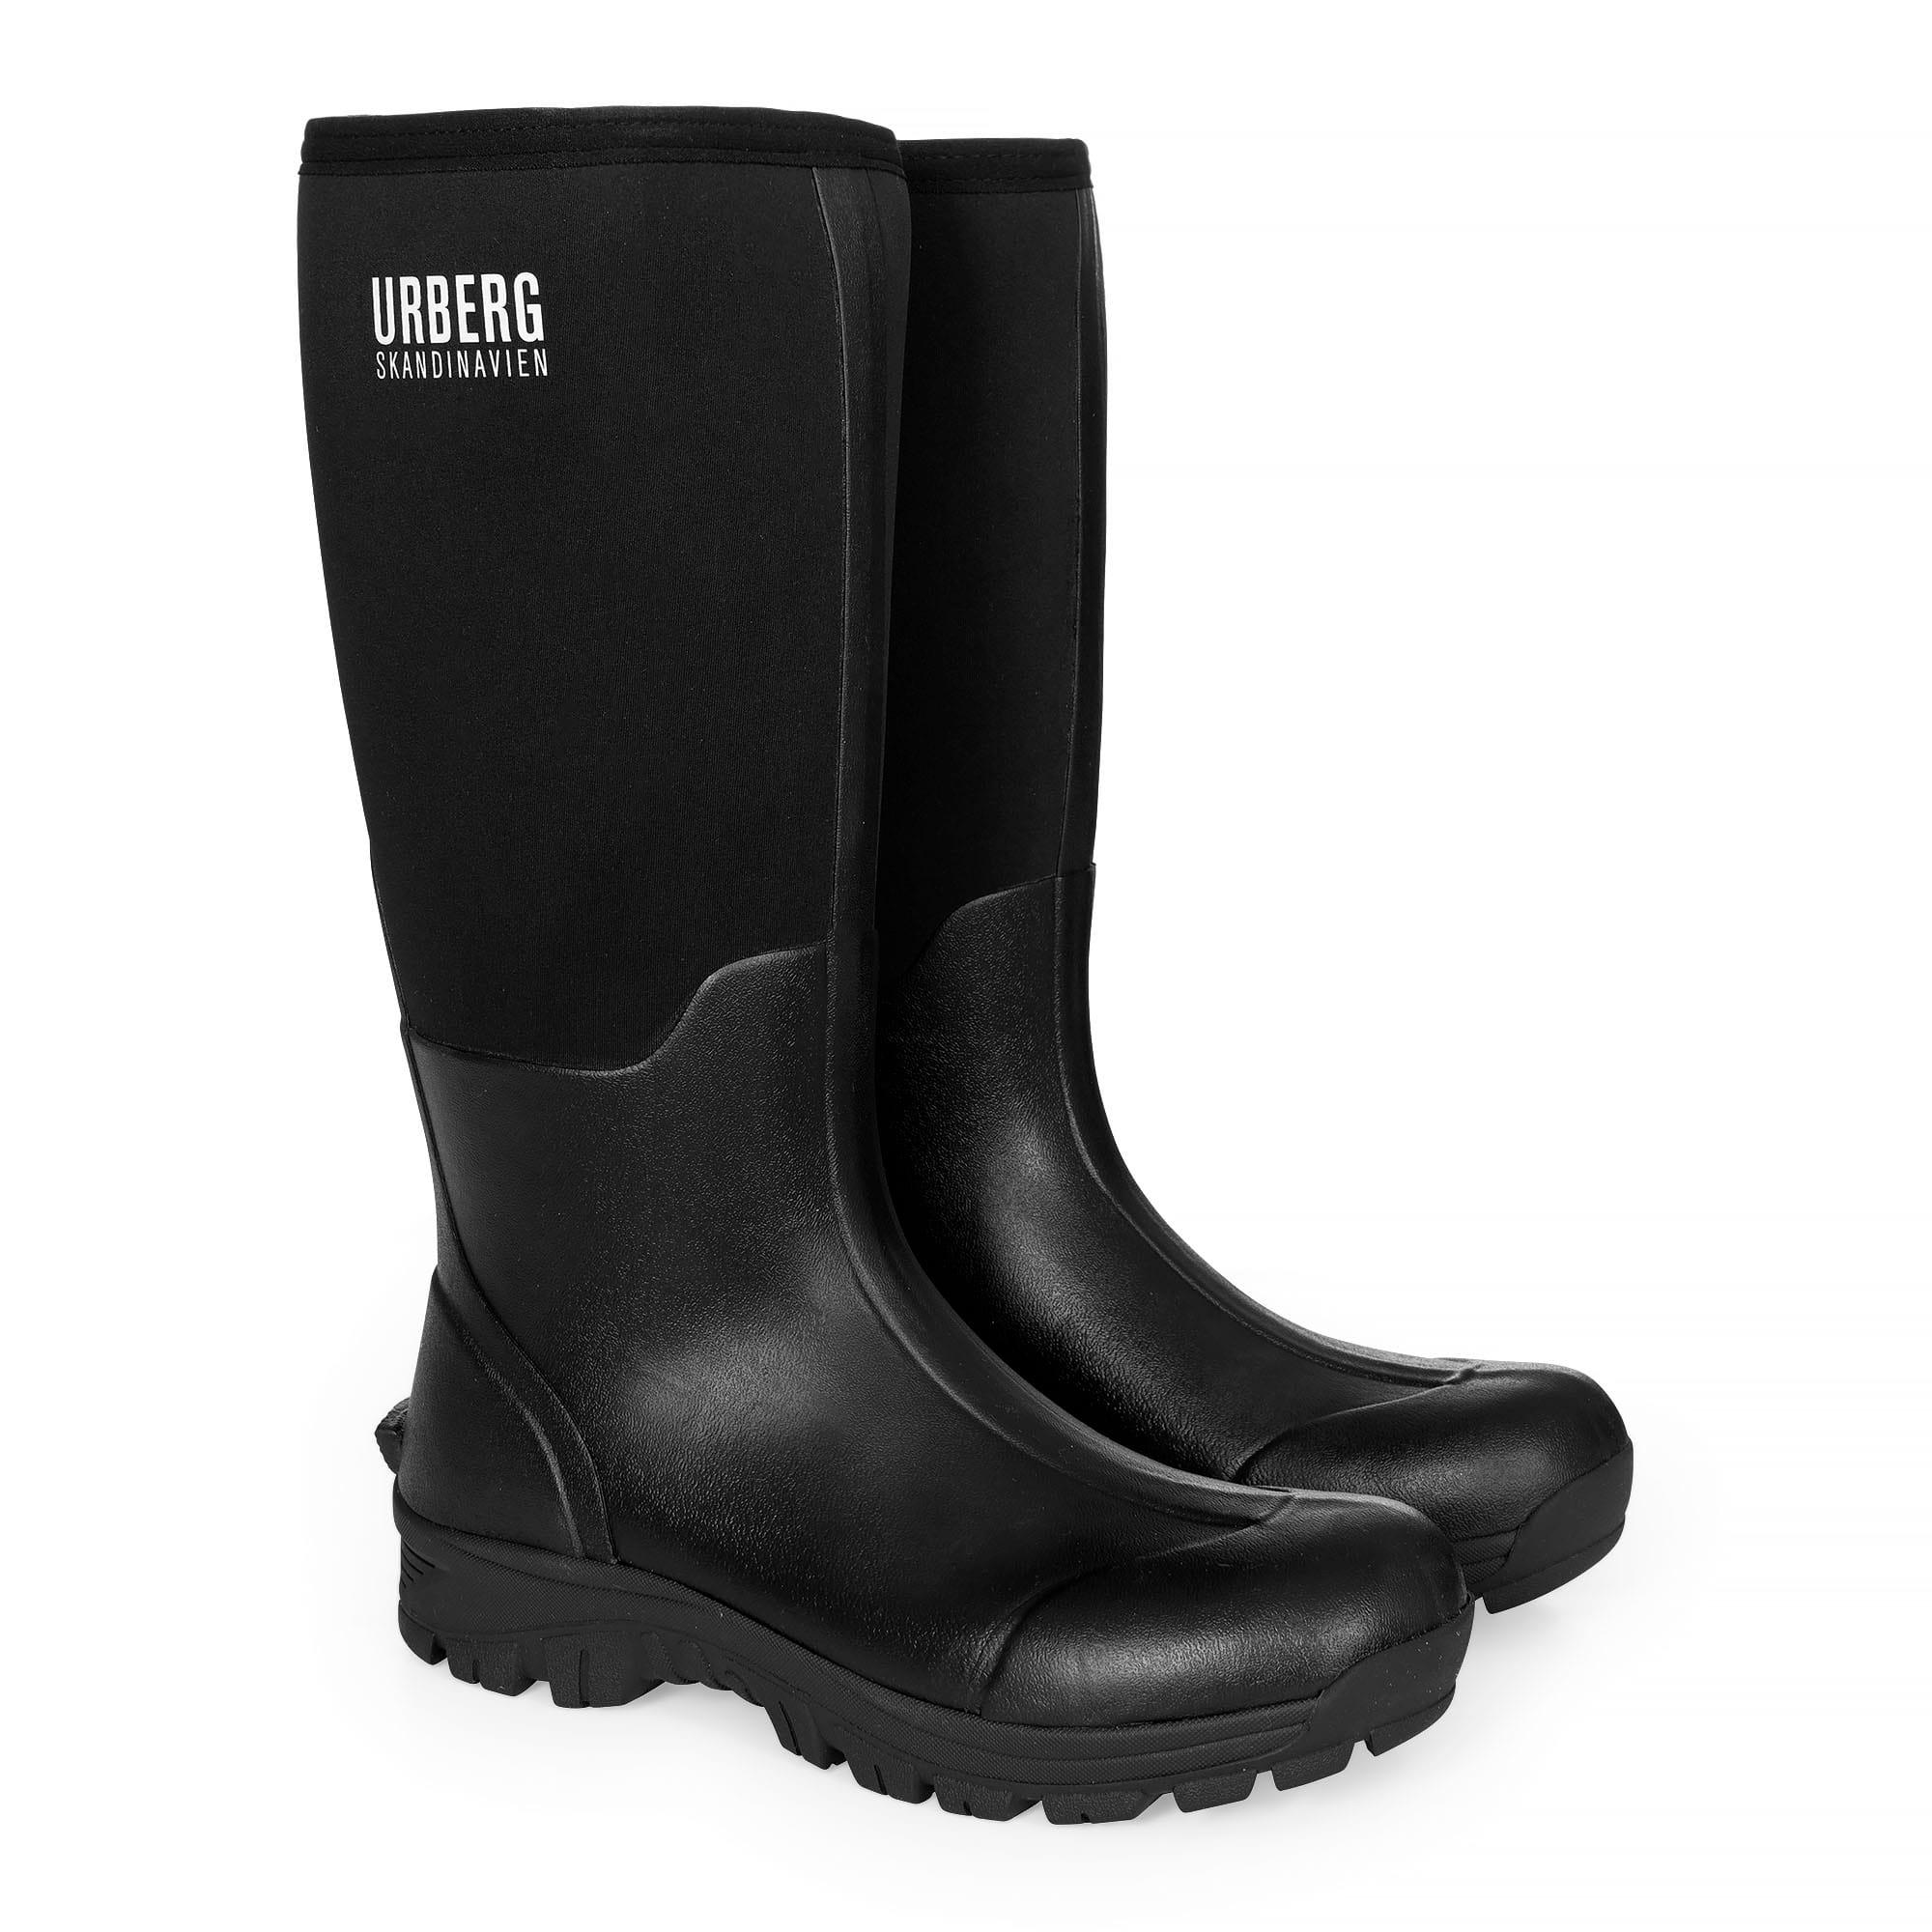 Hyssna Neoprene Boot